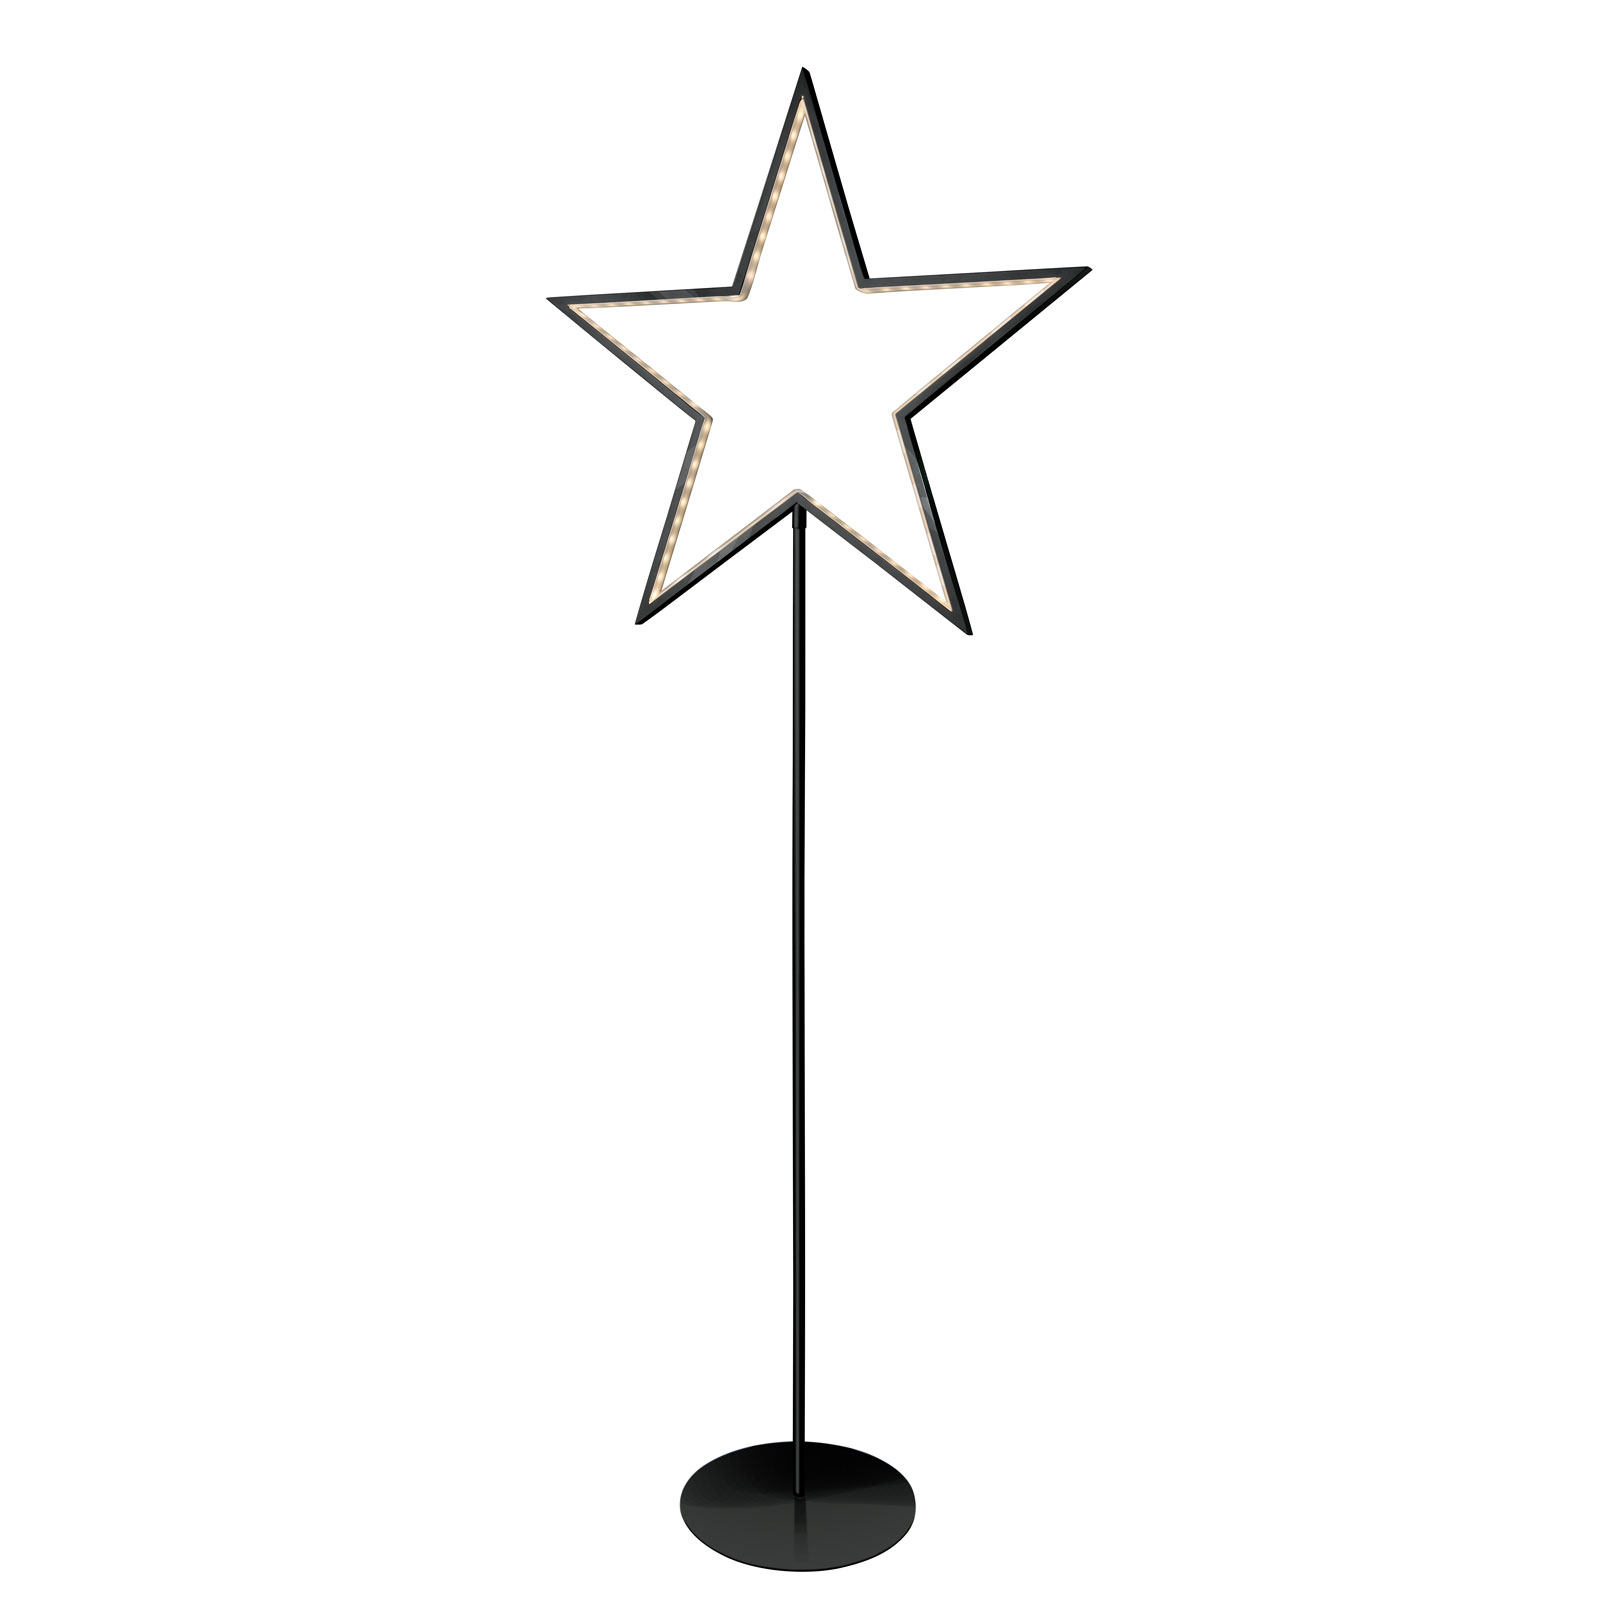 Lucy star decorative light, black, height 130 cm